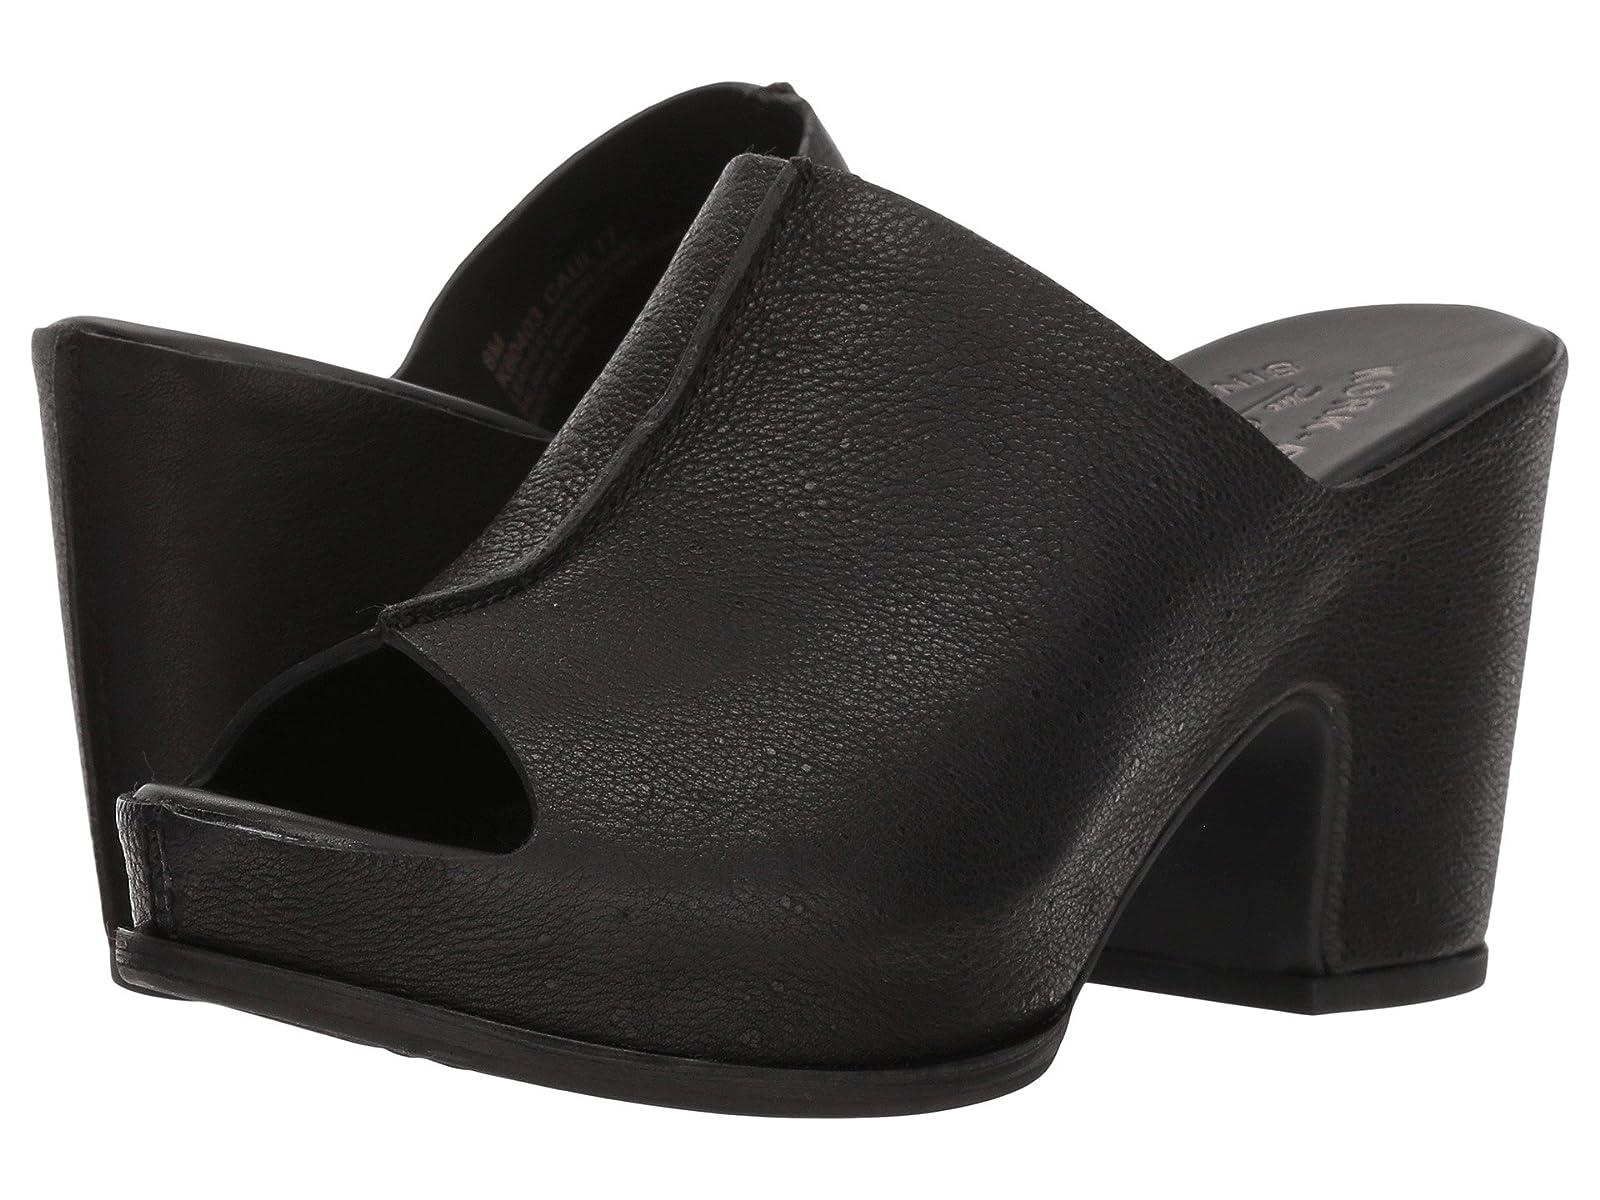 Kork-Ease Santa AnaAtmospheric grades have affordable shoes